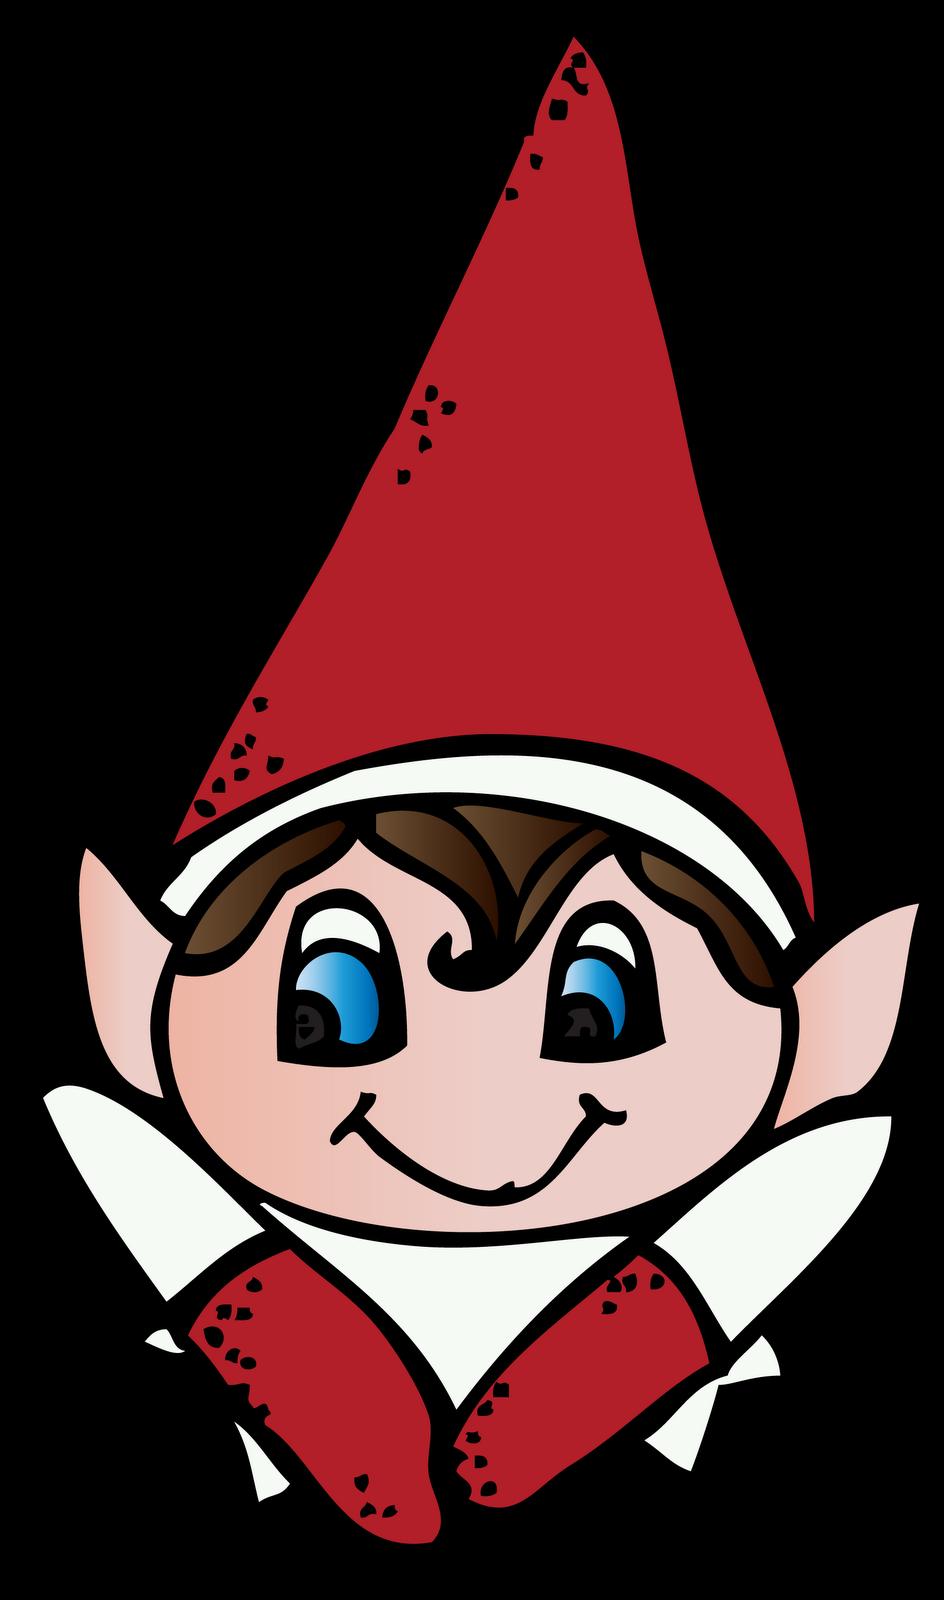 Christmas Elf On The Shelf Clipart.Shelf Clipart Free Download Best Shelf Clipart On